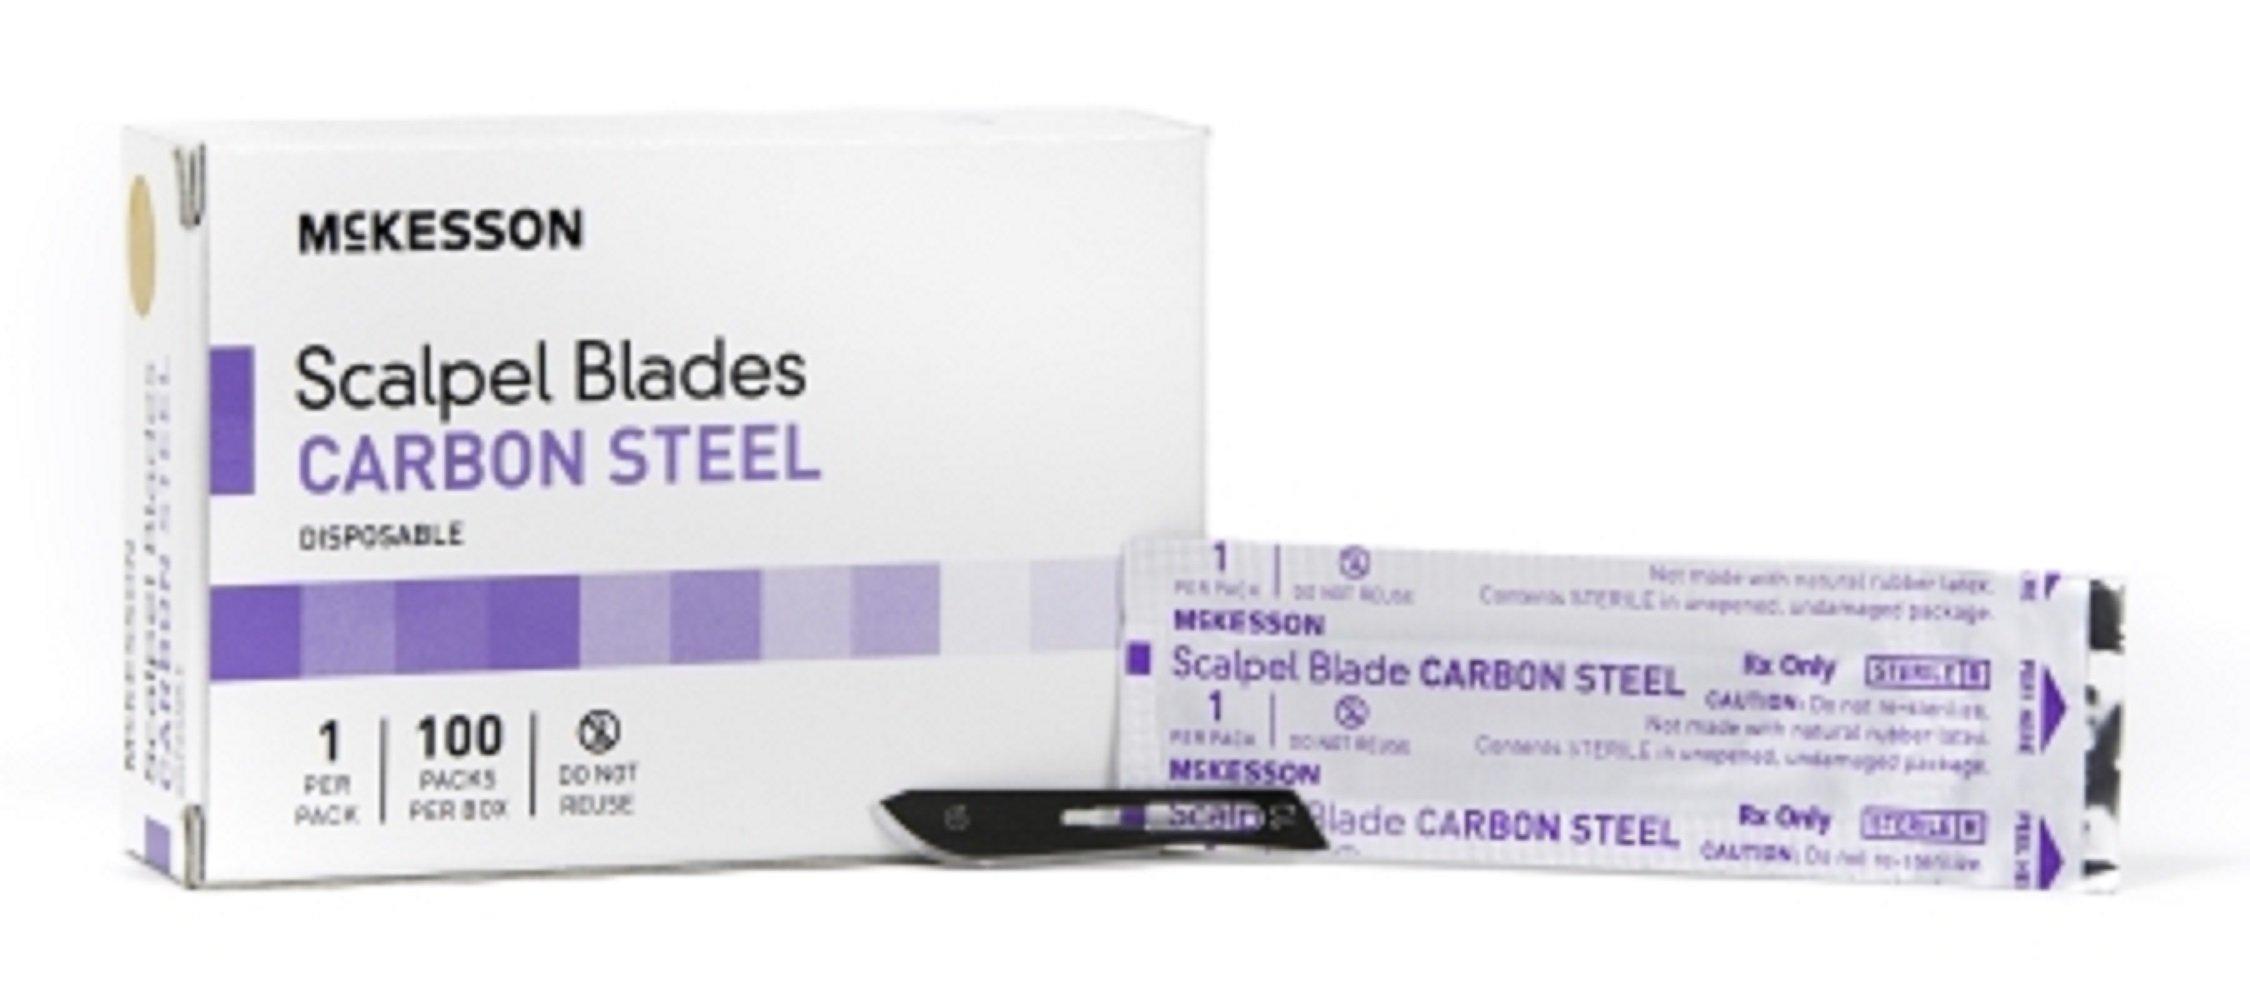 McKesson Brand - Surgical Blade - Carbon Steel - Size 15 - Sterile Disposable - Knife Edge - 1000pcs/Case